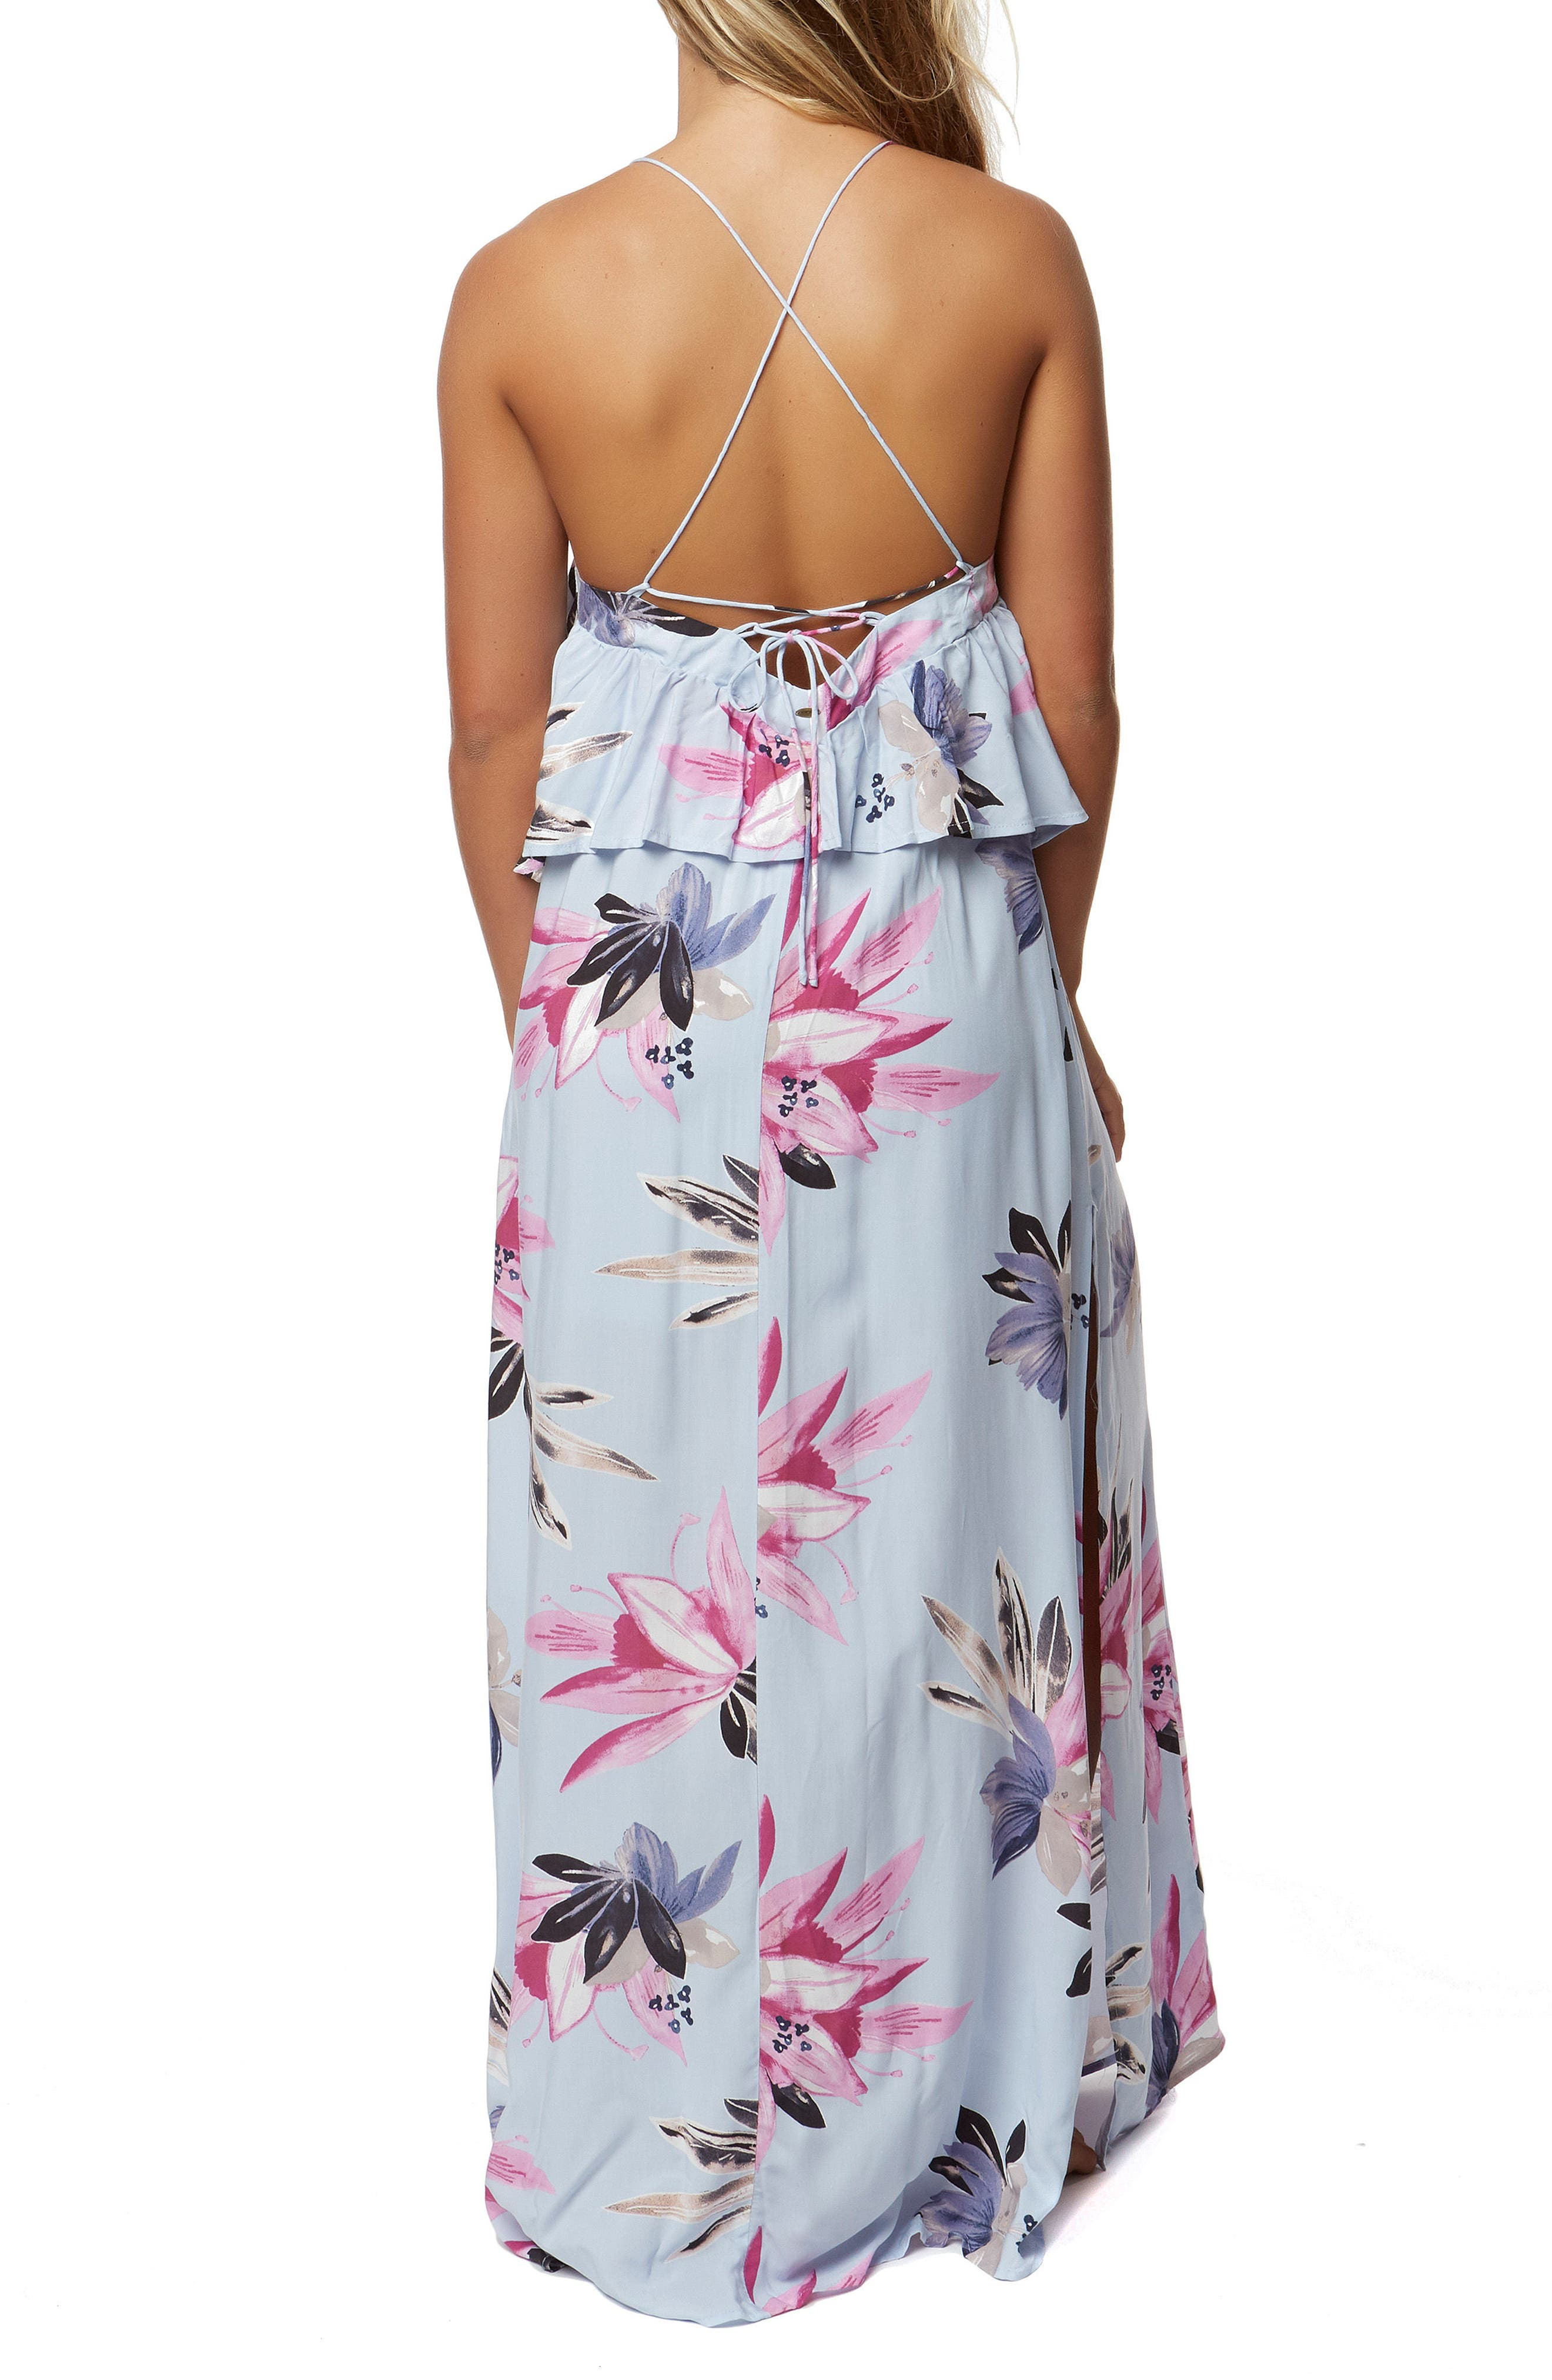 Milly Maxi Dress,                             Alternate thumbnail 2, color,                             Horizon